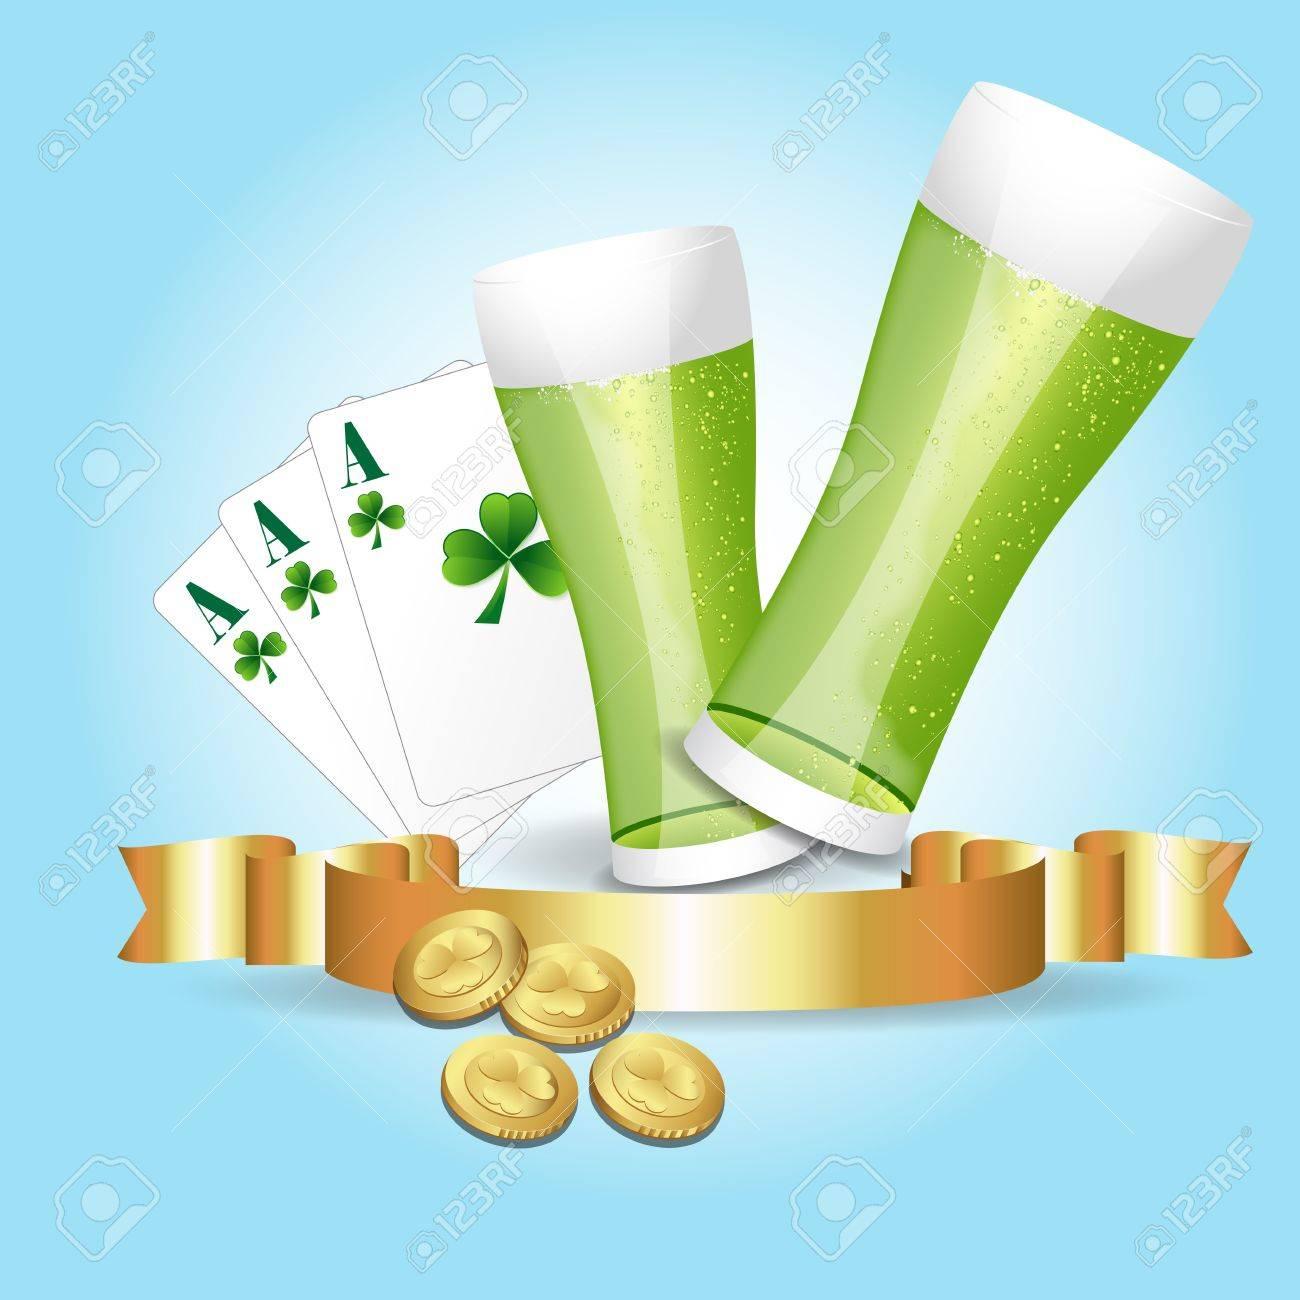 St  Patrick's Day Celebration Stock Vector - 12861449